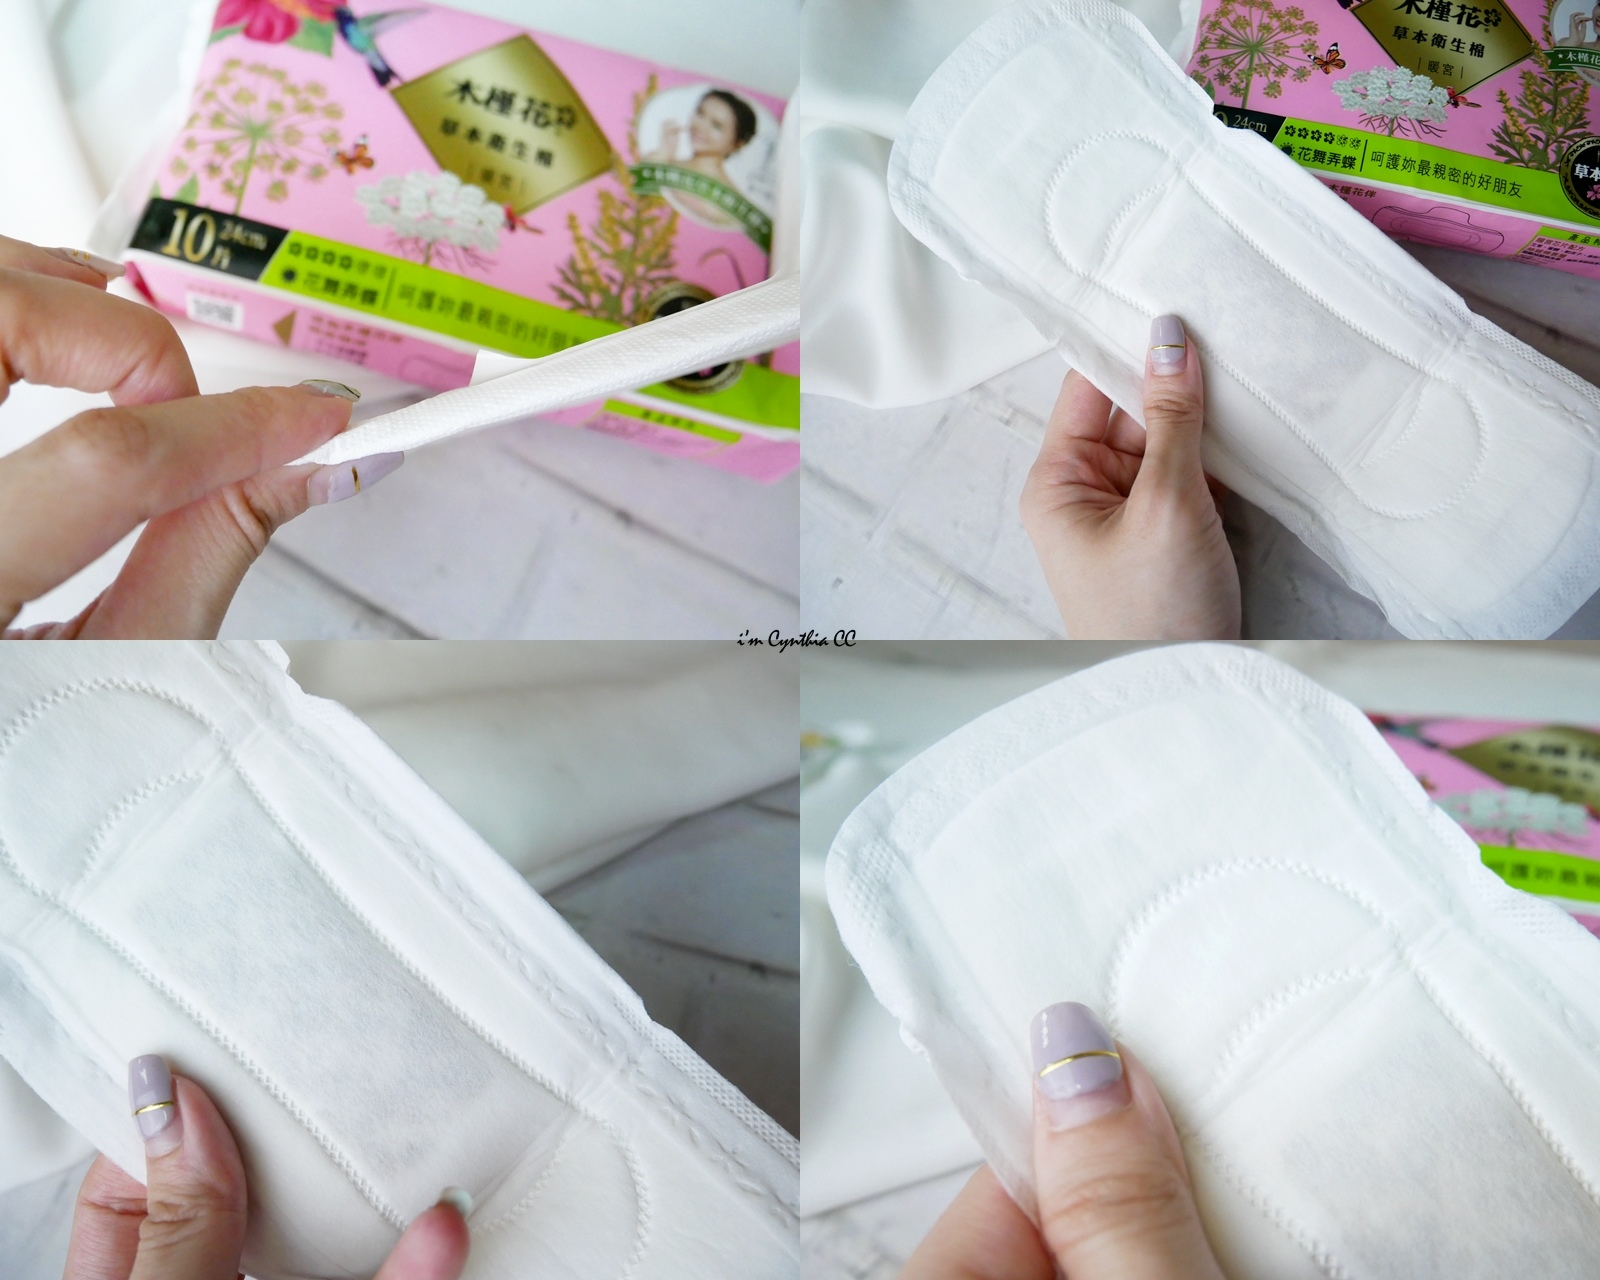 HIBIS木槿花草本衛生棉暖宮&木槿花草本衛生棉涼感加長型護墊